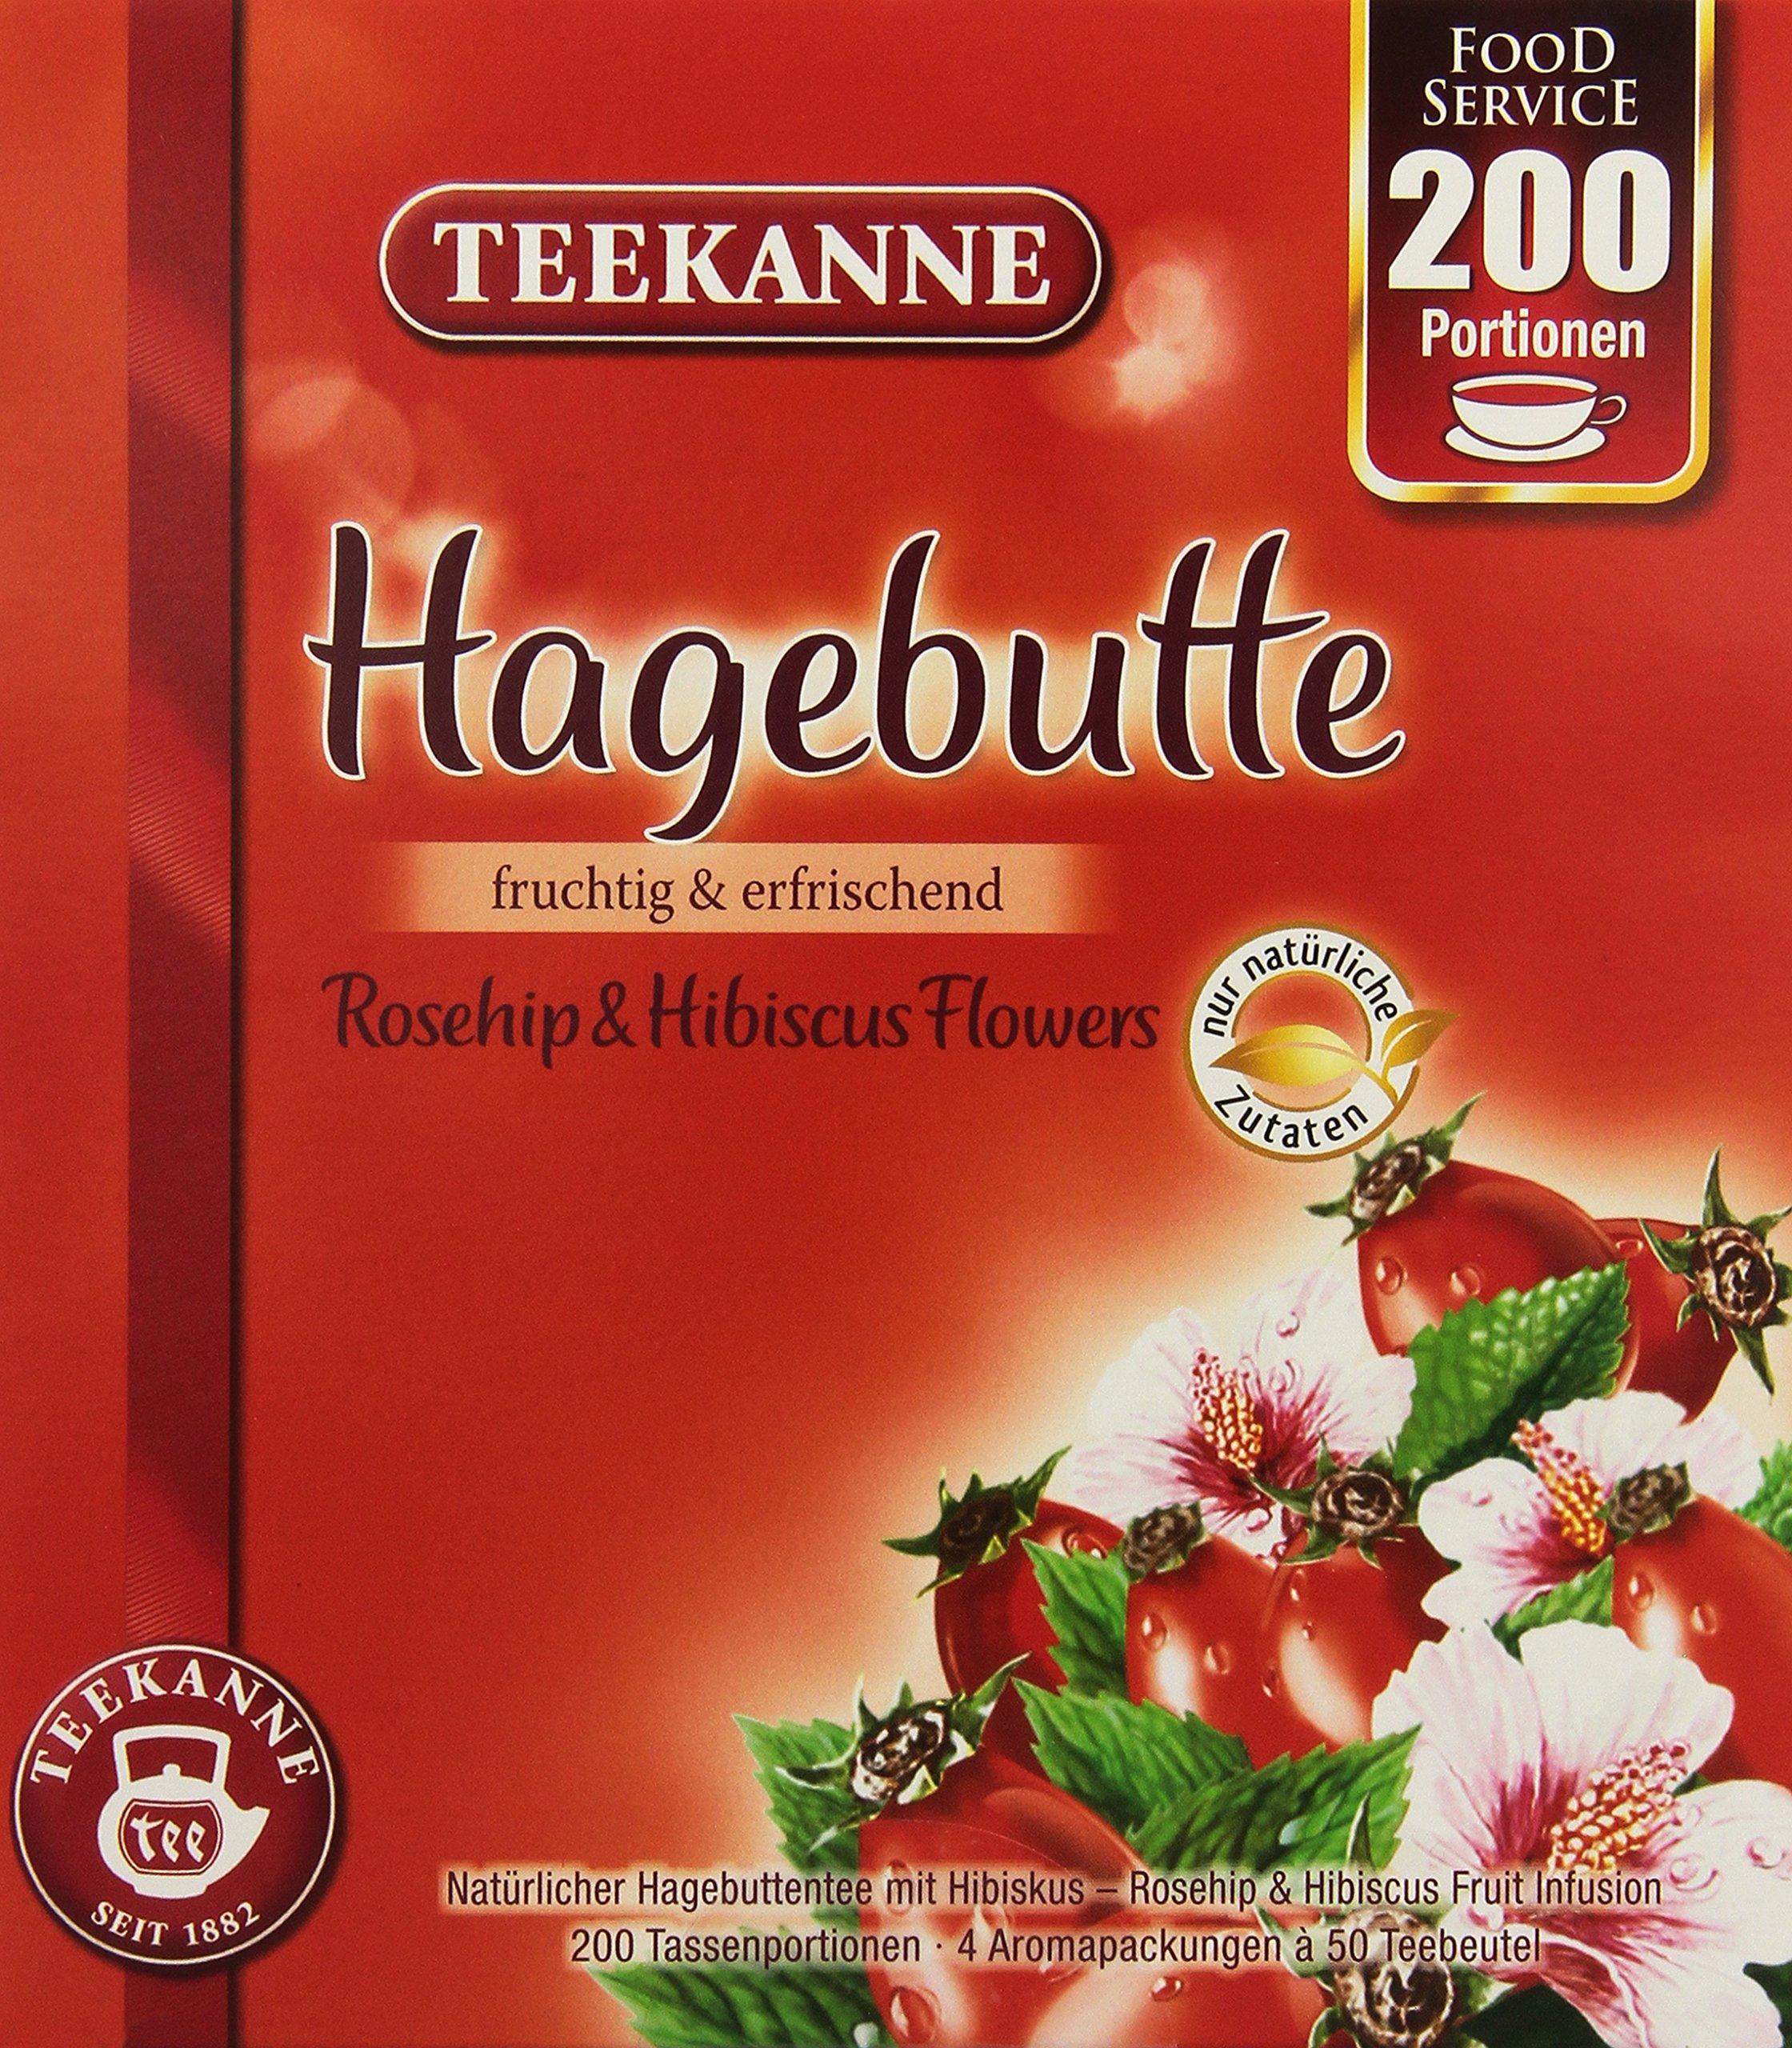 Teekanne-Hagebutte-1er-Pack-1-x-490-g